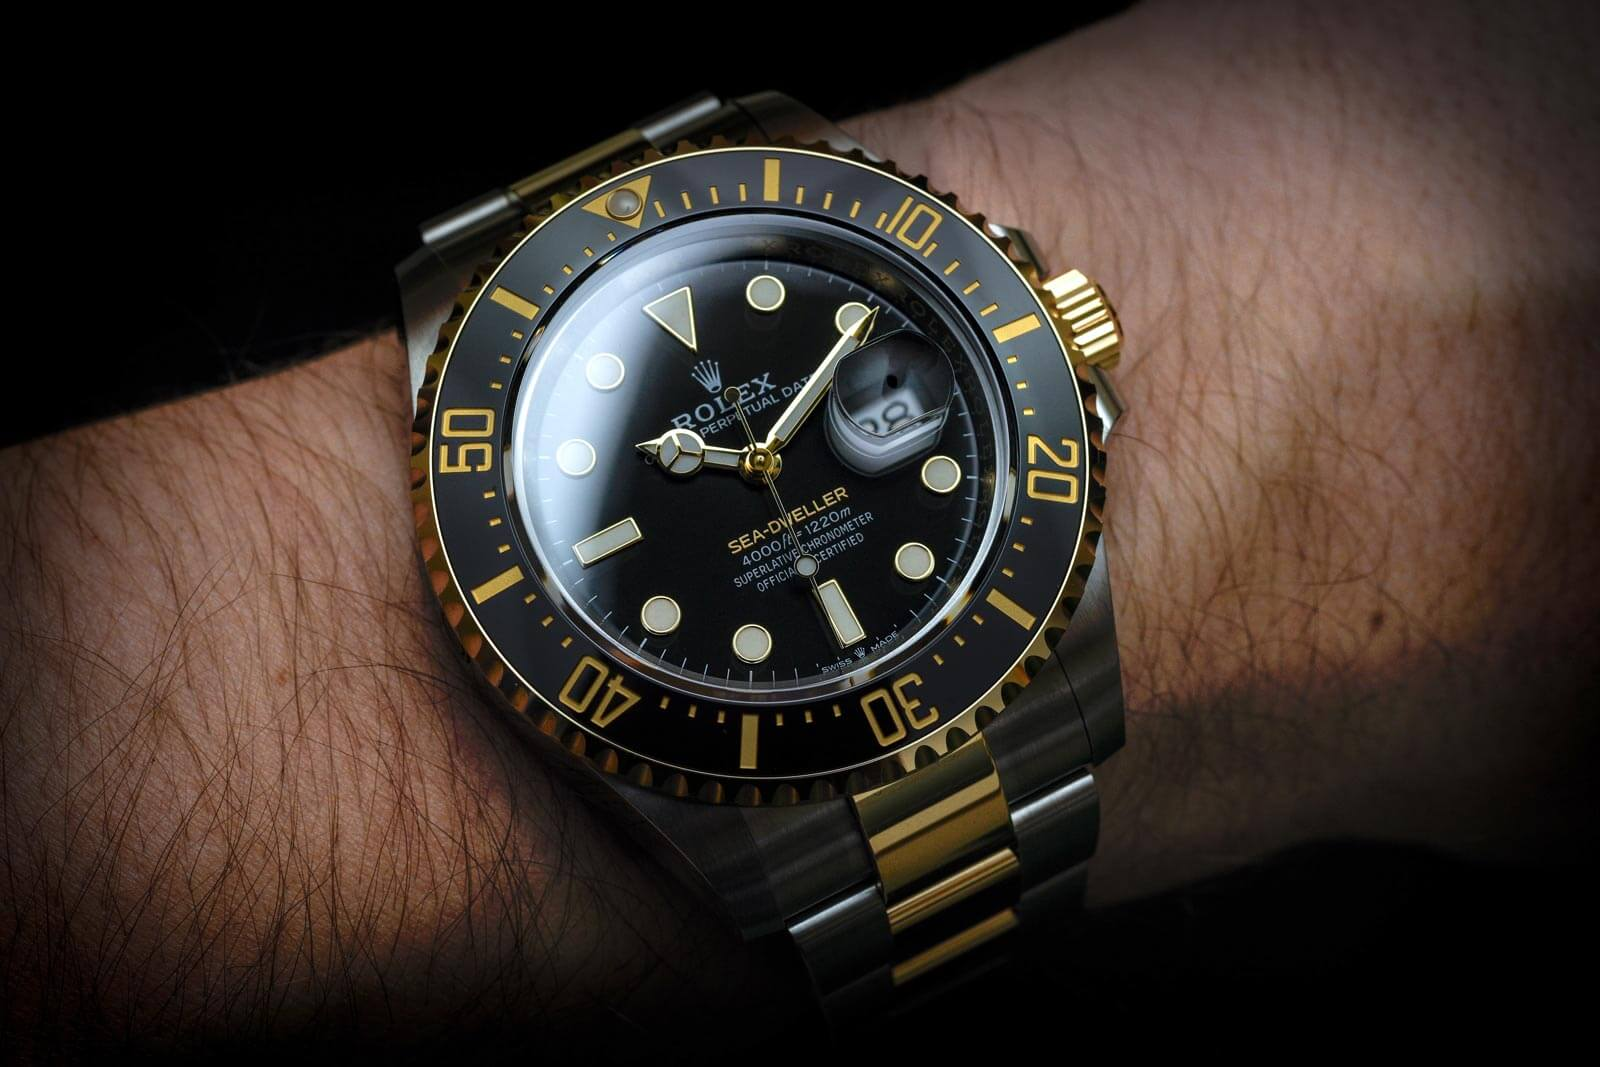 Rolex Sea-Dweller <br> Referenca 126603